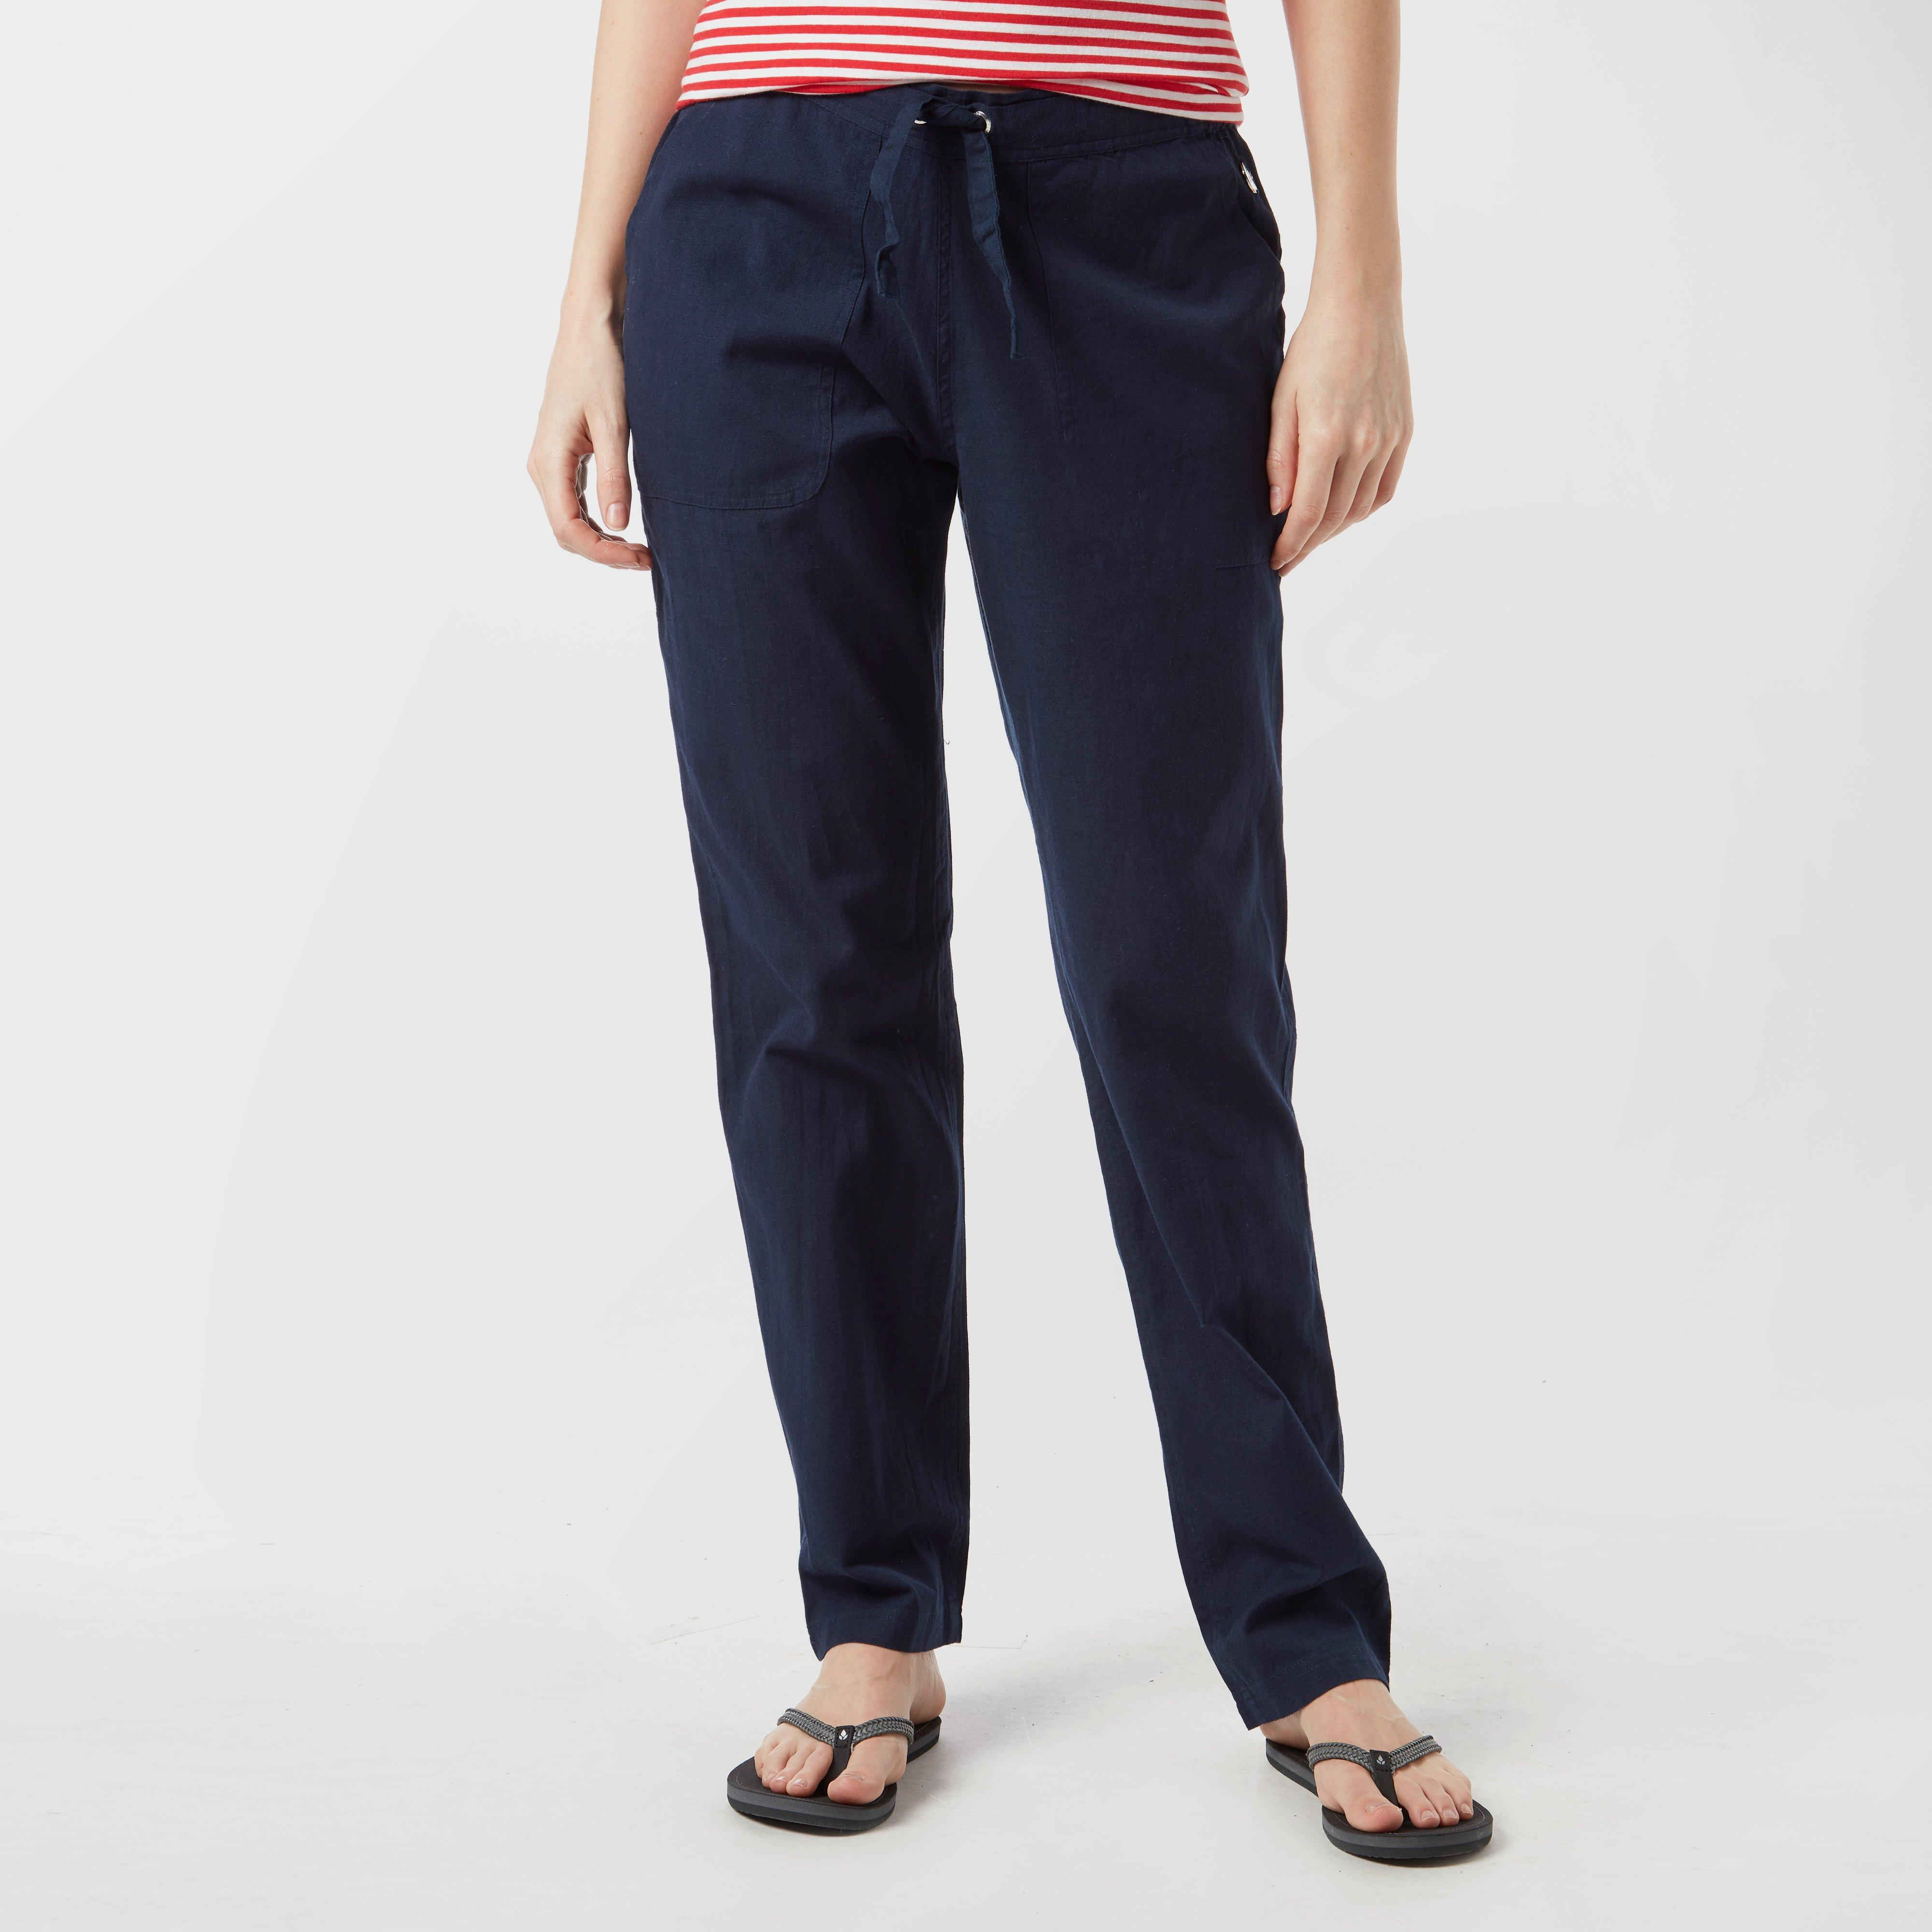 Regatta Regatta Womens Quanda Drawstring Trousers - Navy, Navy